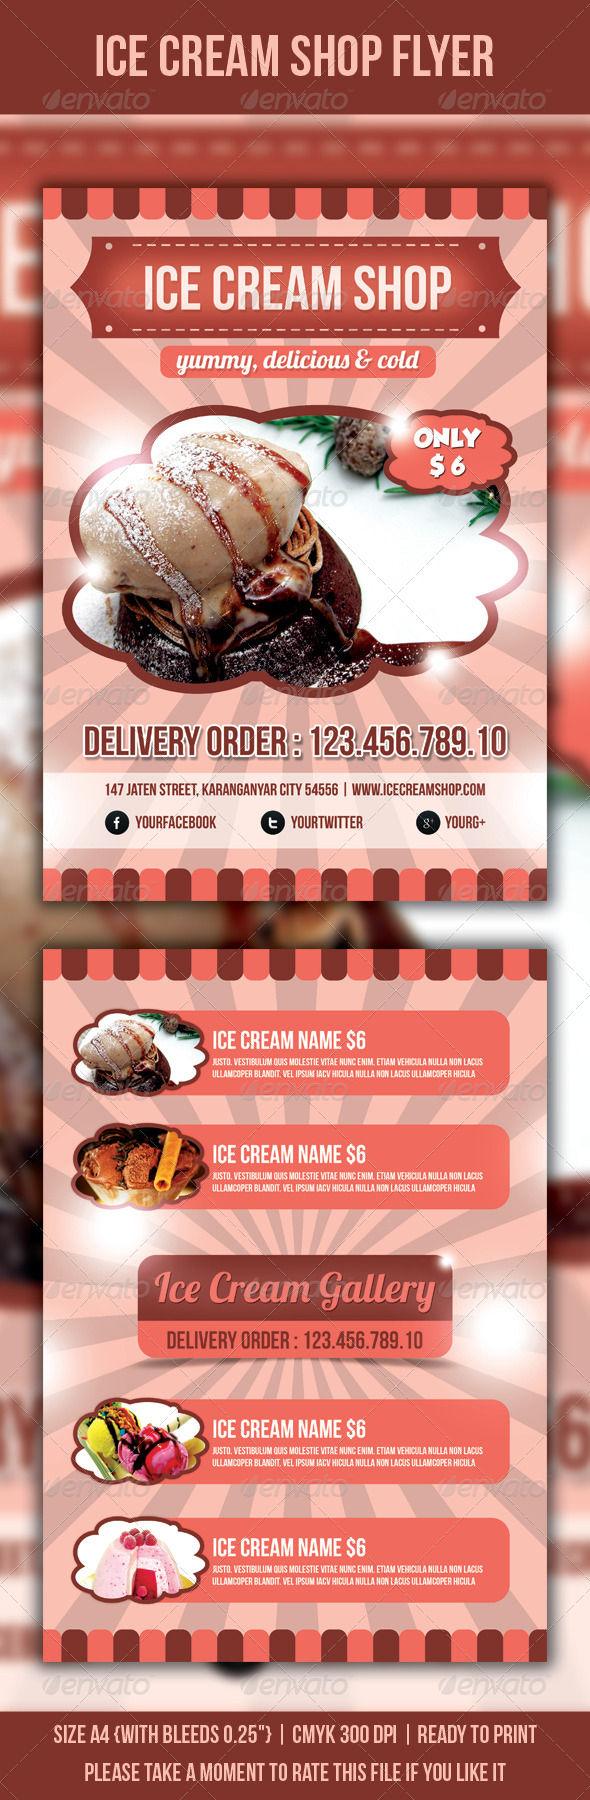 GraphicRiver Ice Cream Shop Flyer 3898023